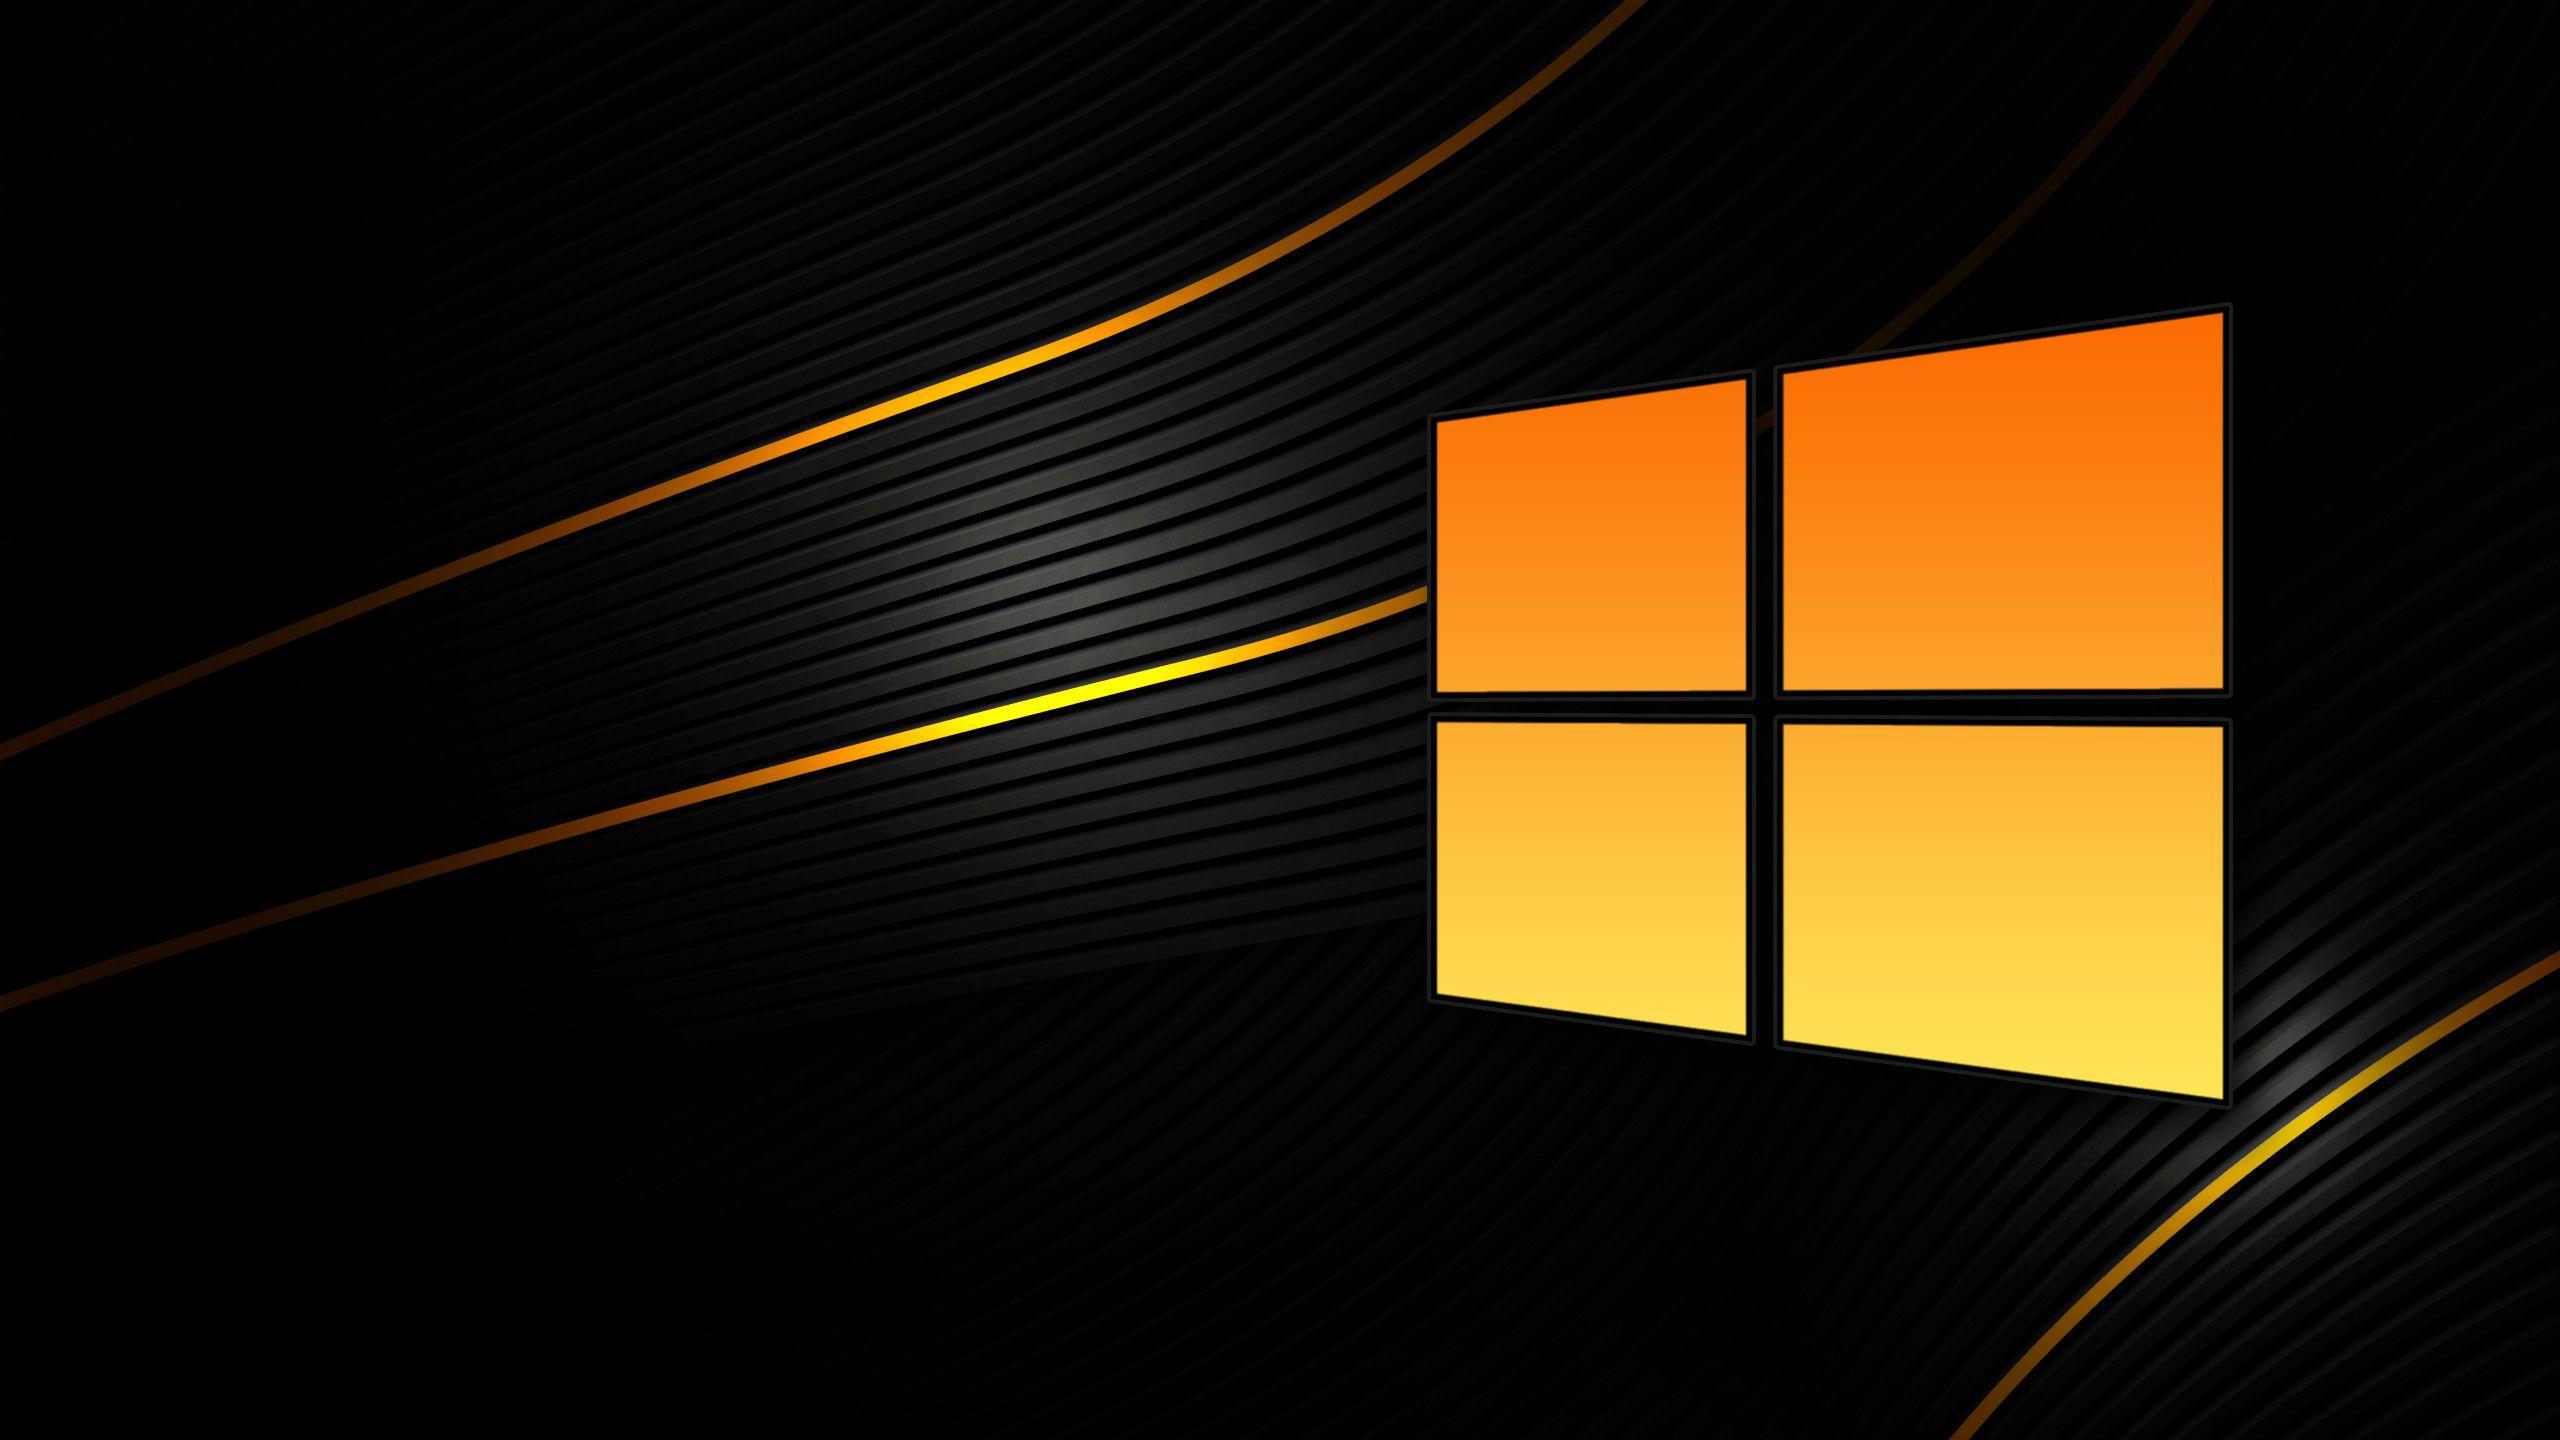 Windows 10 Lock Screen Wallpaper Funny